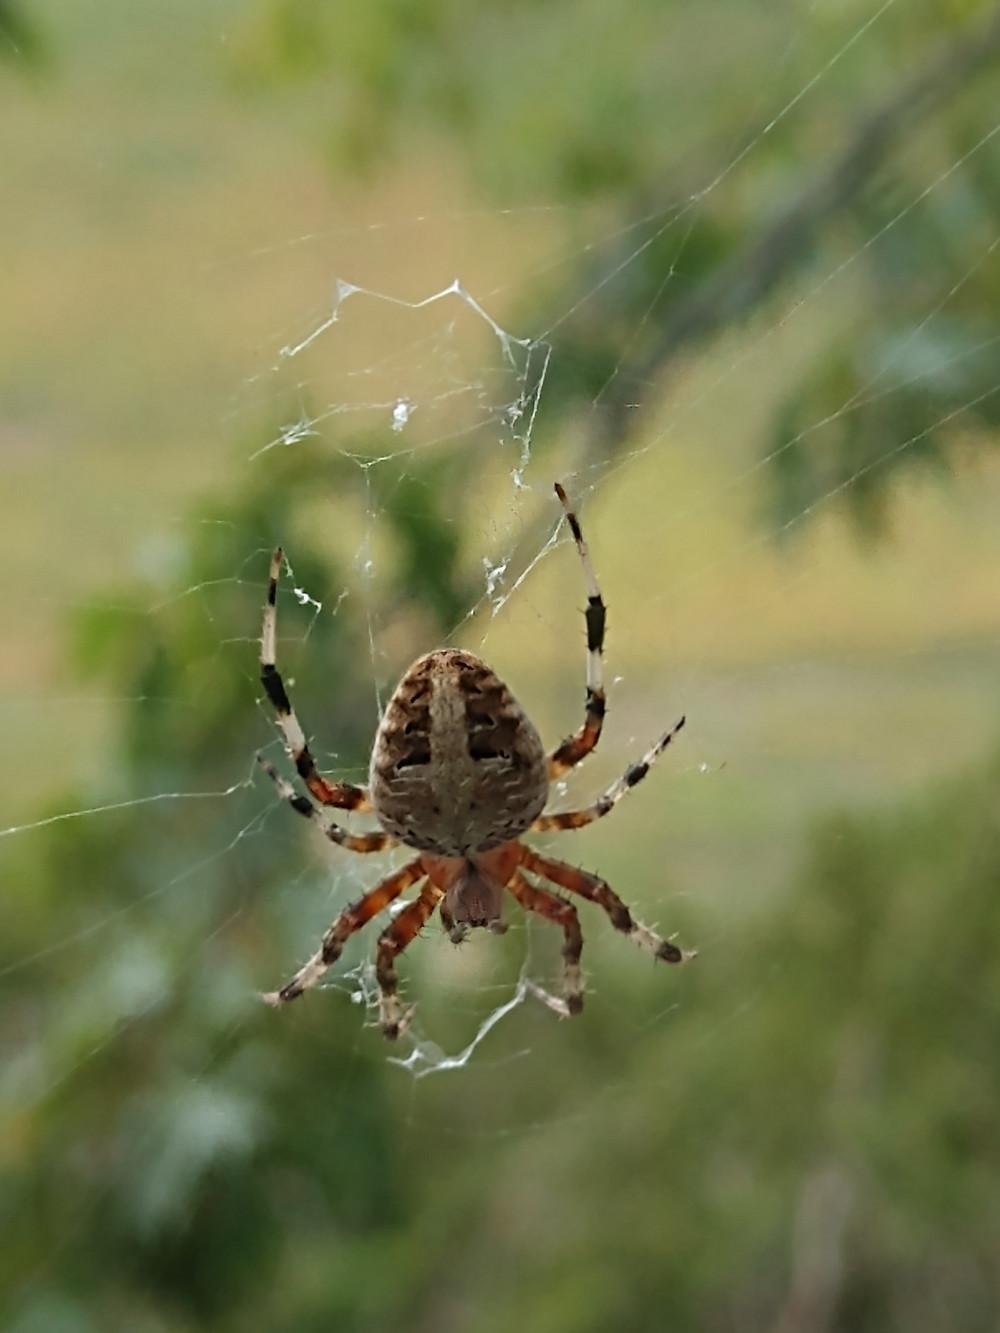 An Orb Weaving Spider